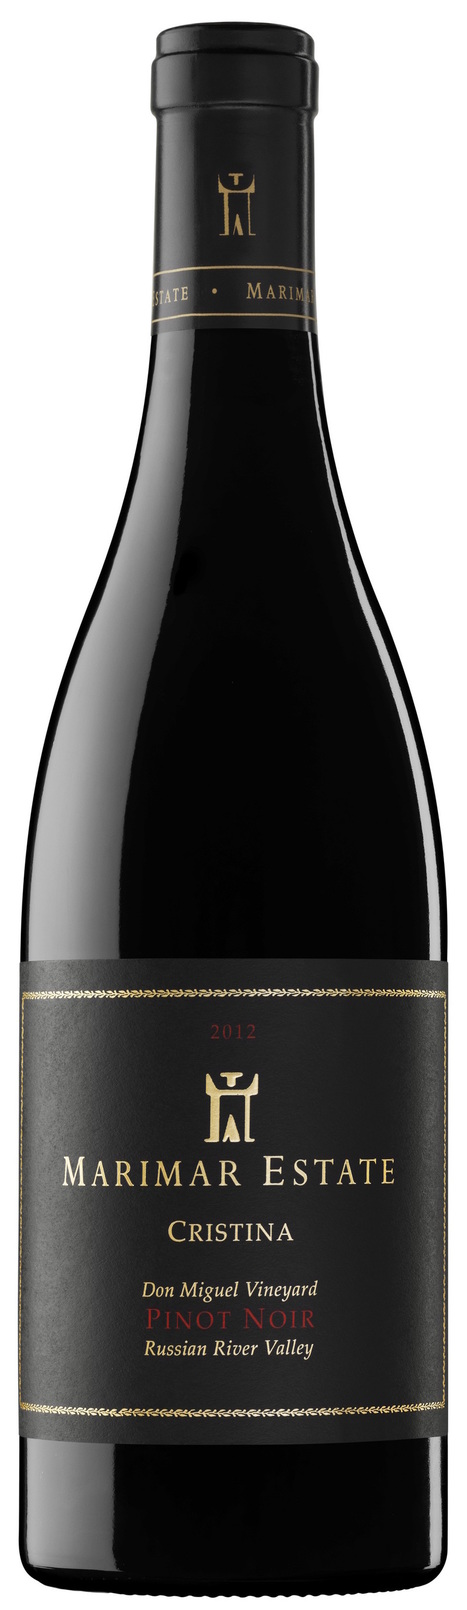 The Marimar Estate – wines of elegance & beauty | Wine from Down Under | Scoop.it